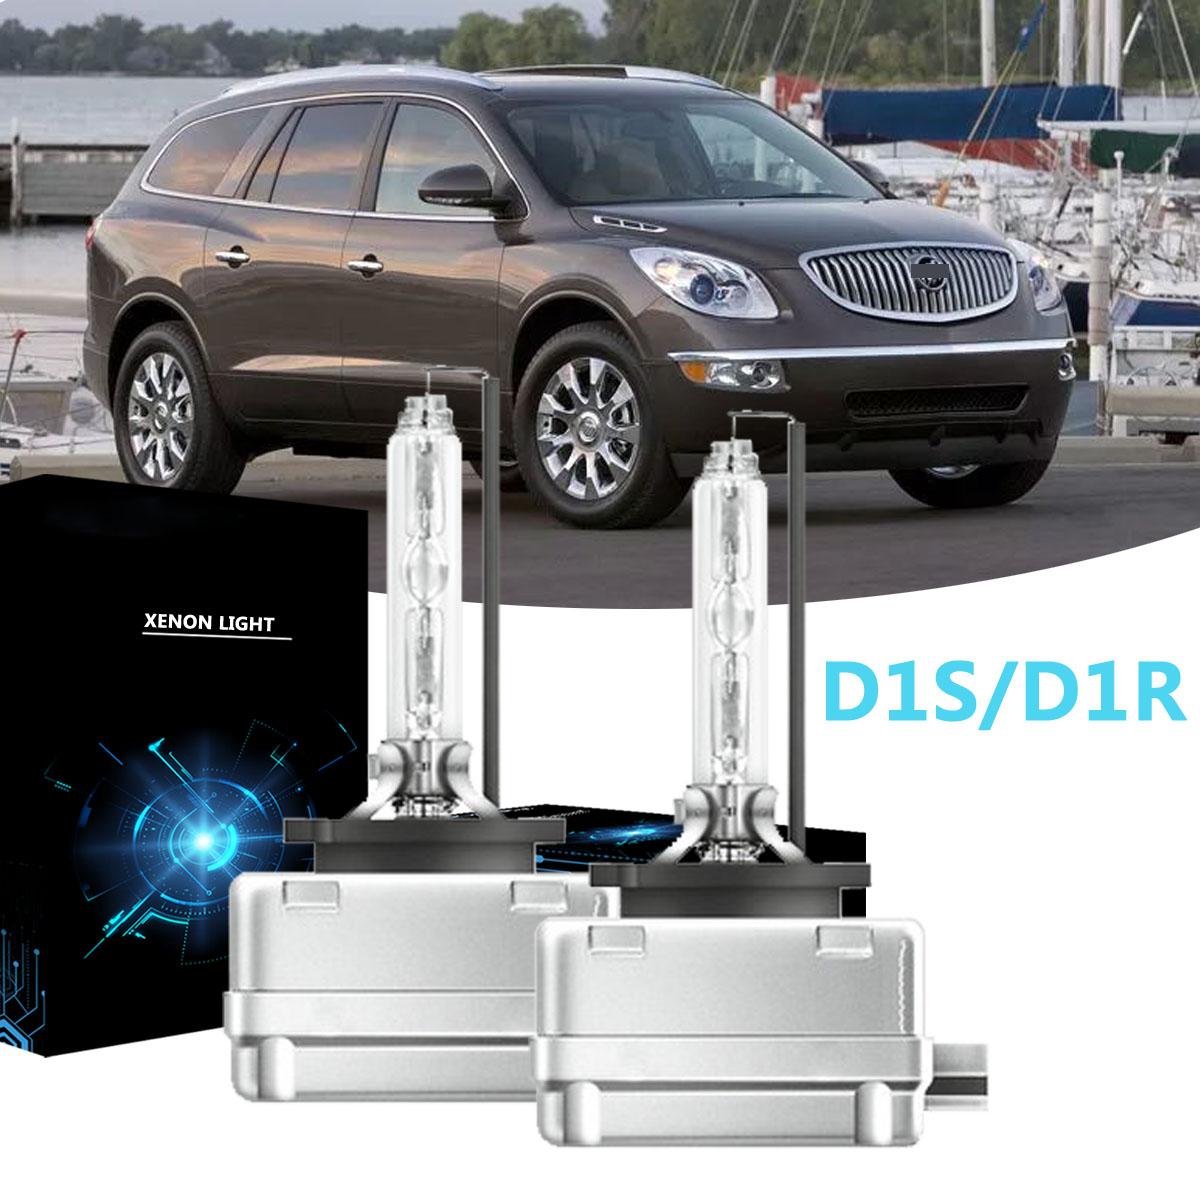 D1S D1R HID Xenon 2007-14 Cadillac Escalade ESV EXT Replacement Headlight Bulbs